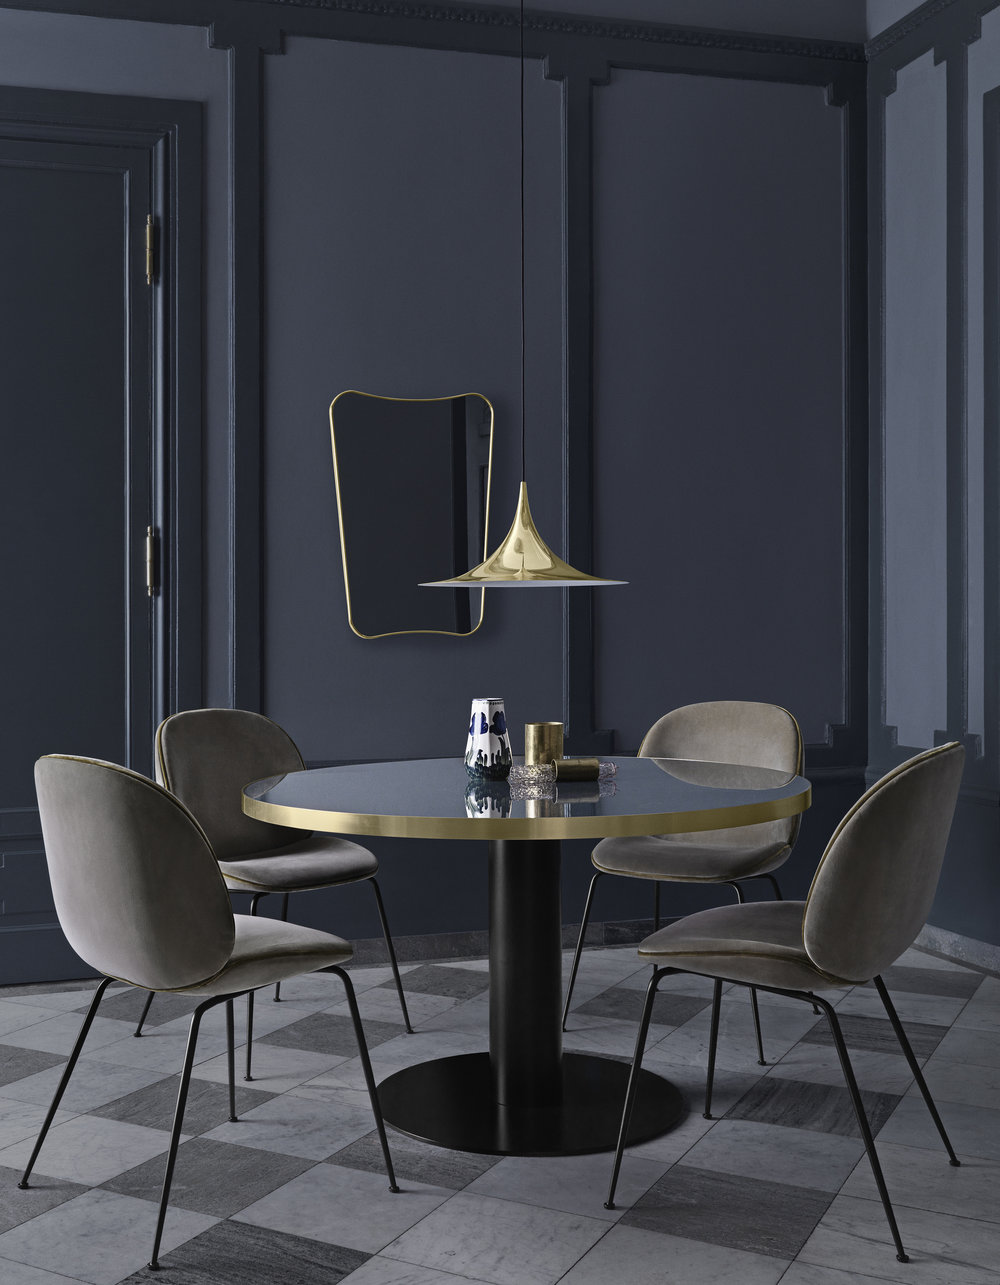 F.A. 33 mirror_Beetle chair - Velluto di Cotone 294, piping 1180_Gubi table 2.0 - granite grey_Semi pendant Ø47- brass.jpg